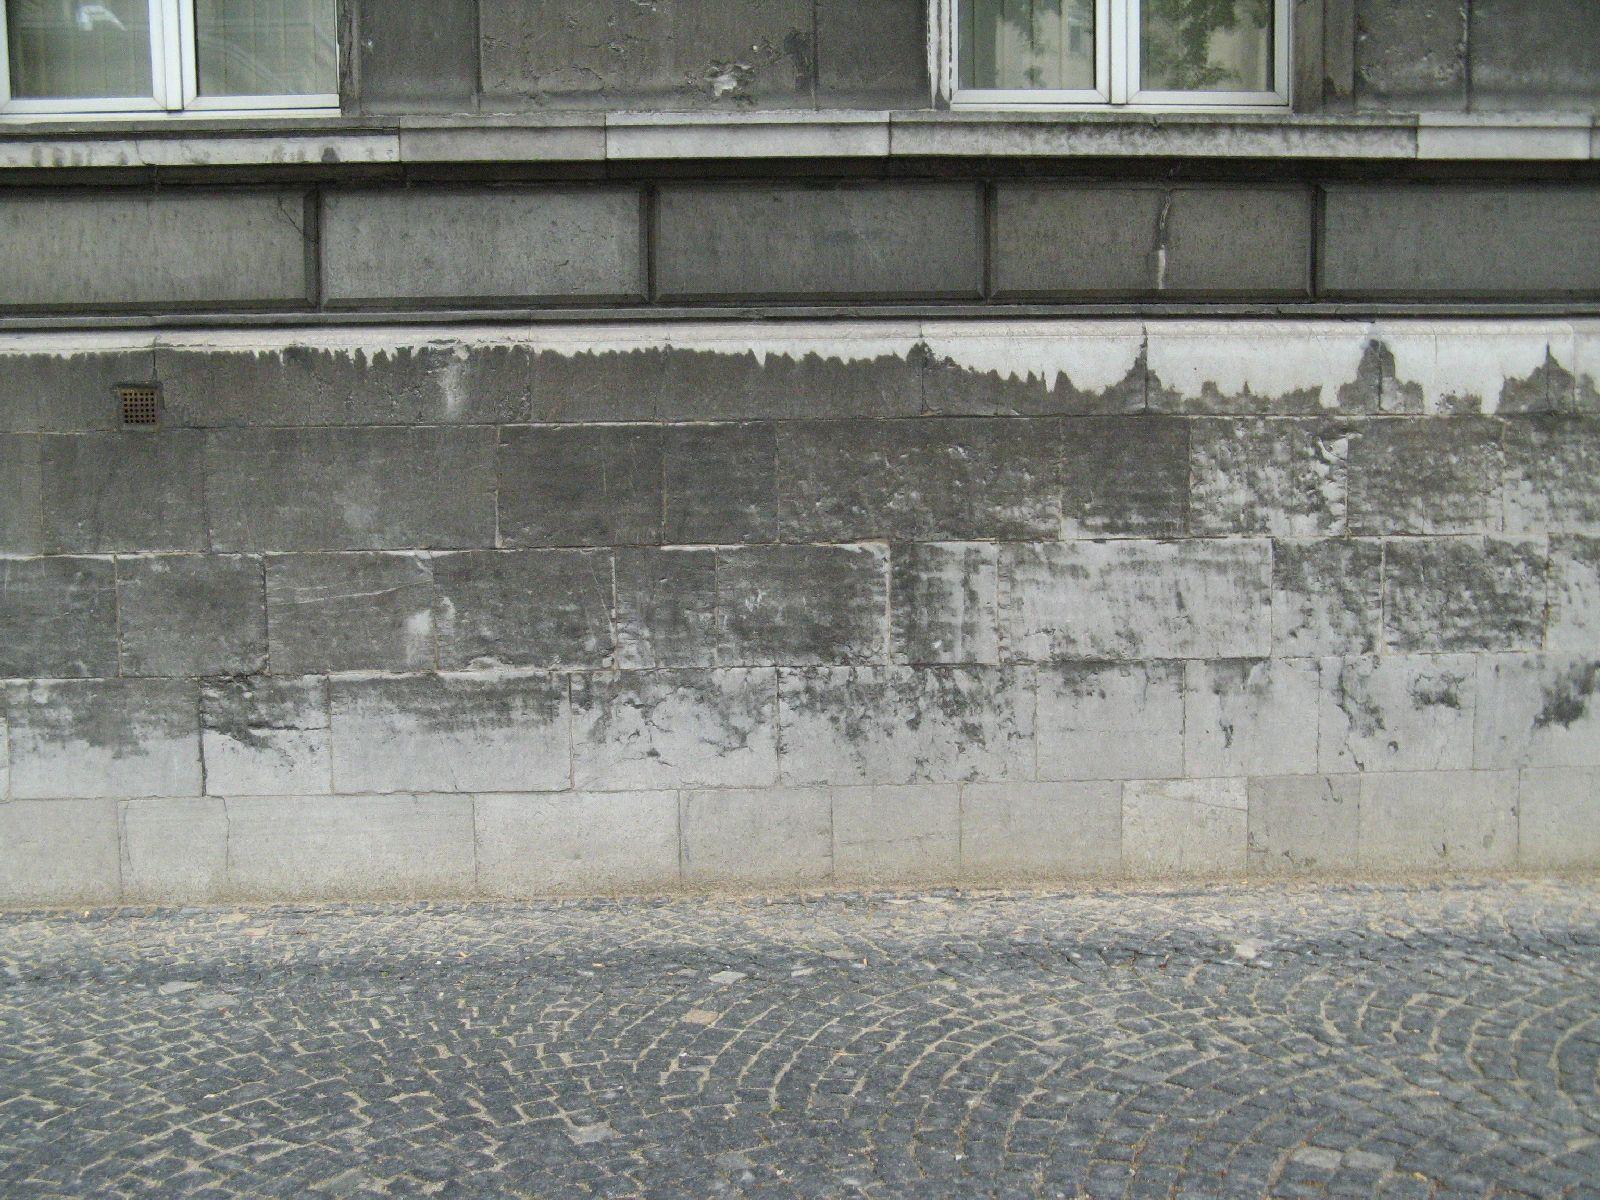 Gebaeude-Architektur_Textur_B_00410